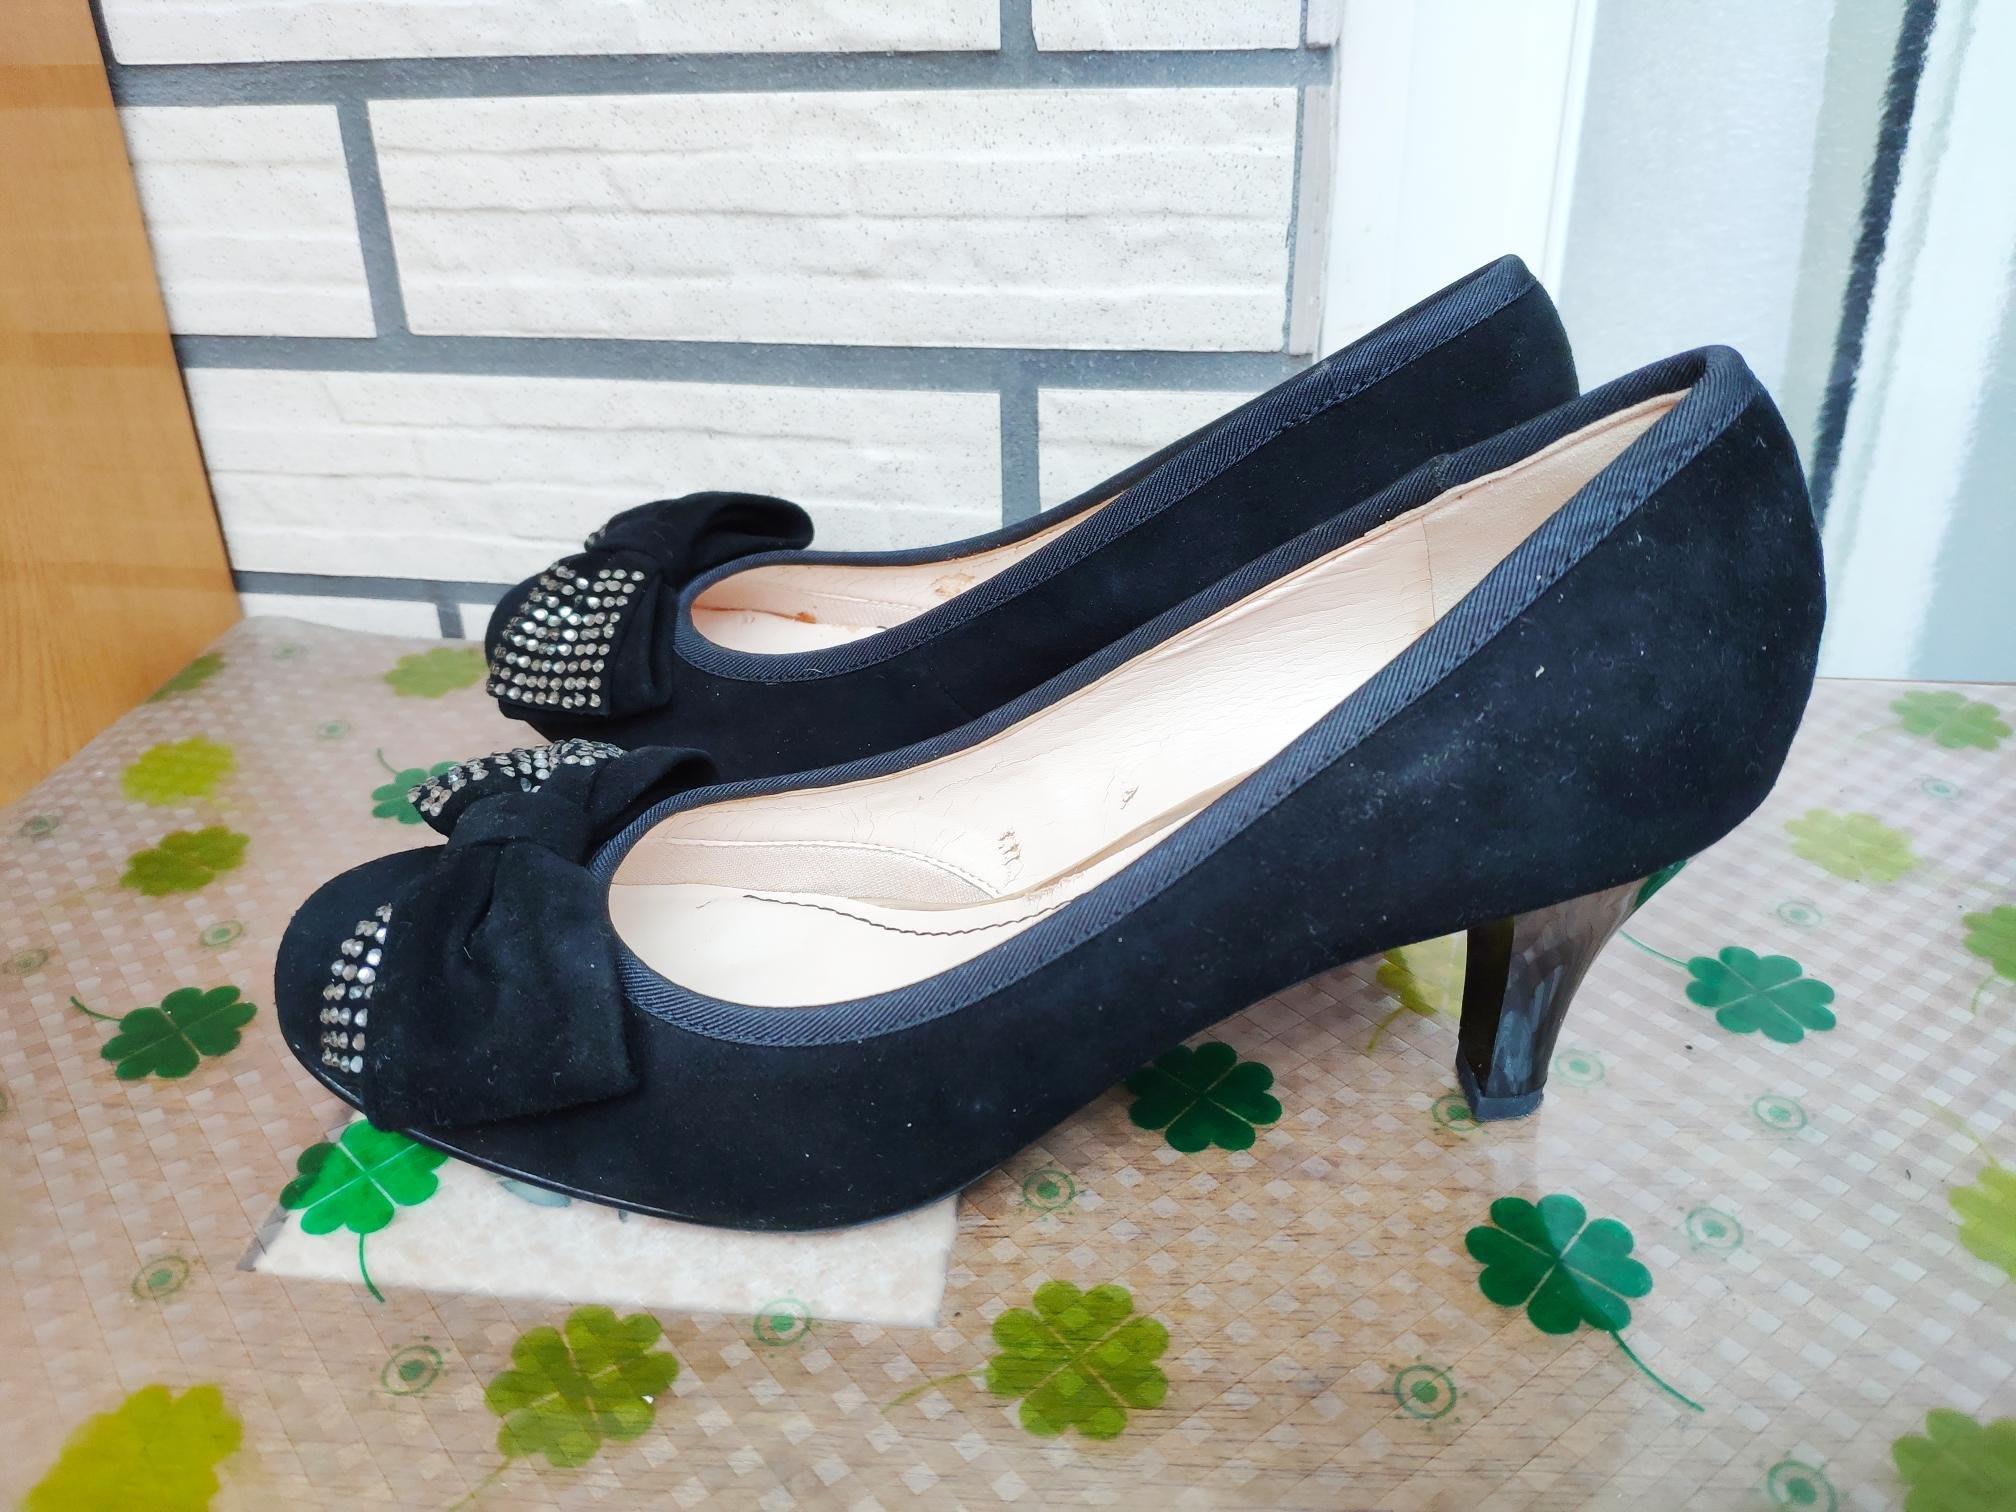 SENSE 1991全新尊貴黑高跟鞋~尺碼 23.5